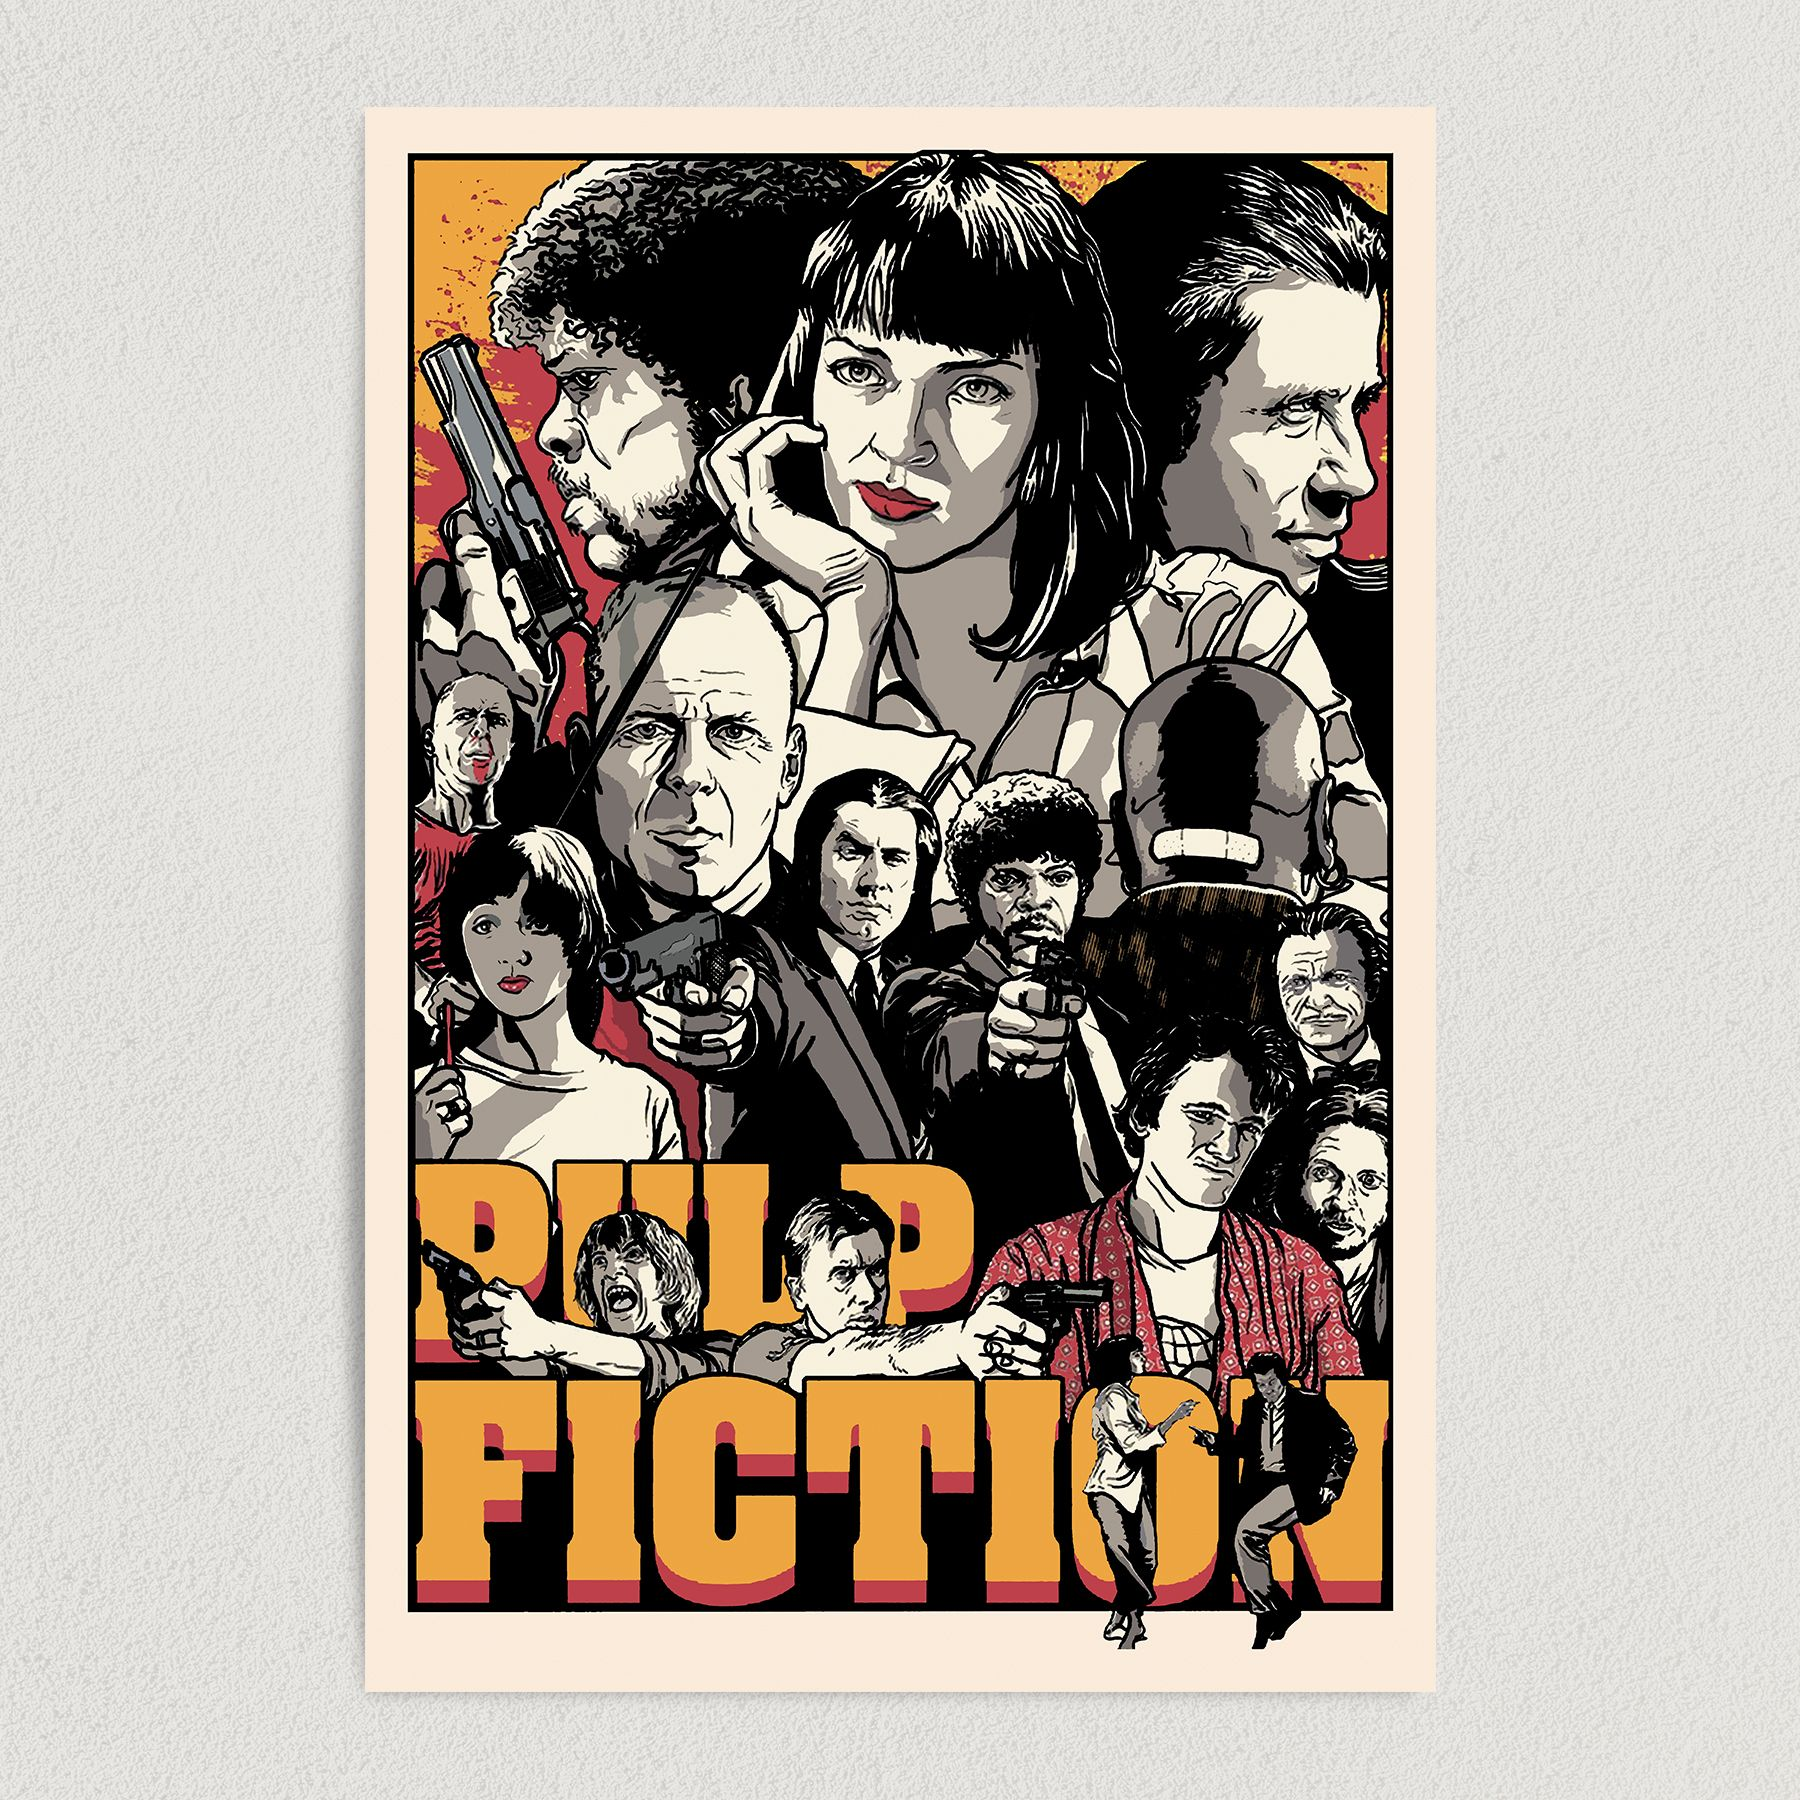 Pulp Fiction Quentin Tarantino Cult Classic Movie Art Print Poster 12″ x 18″ Wall Art M2133